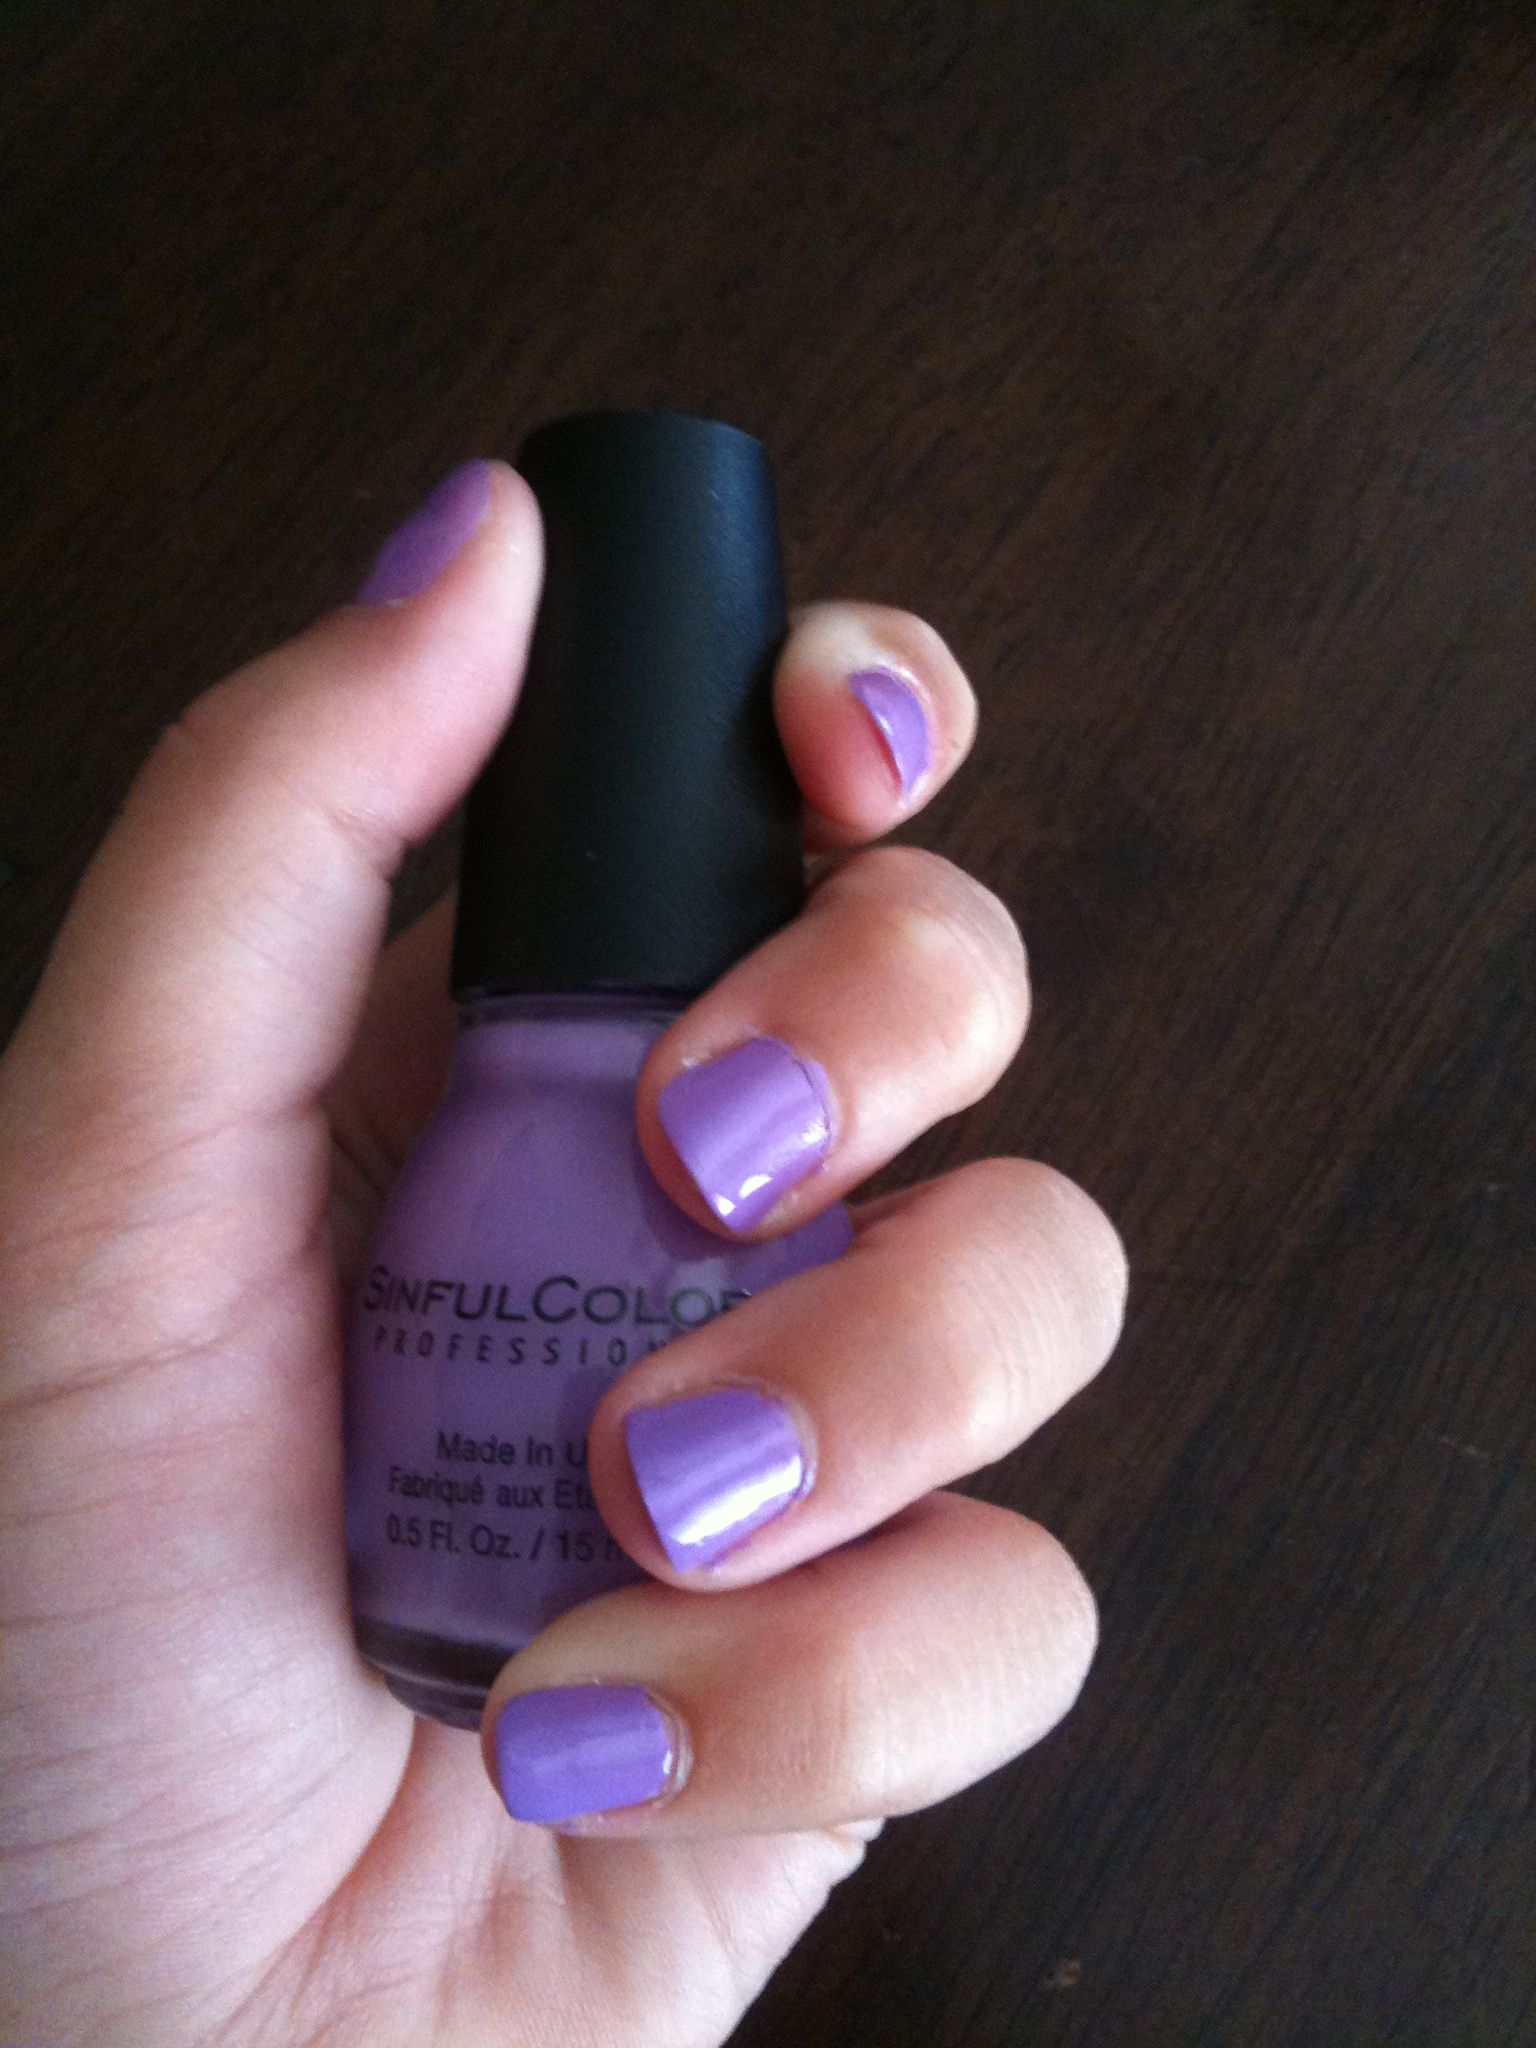 Cute purple nails